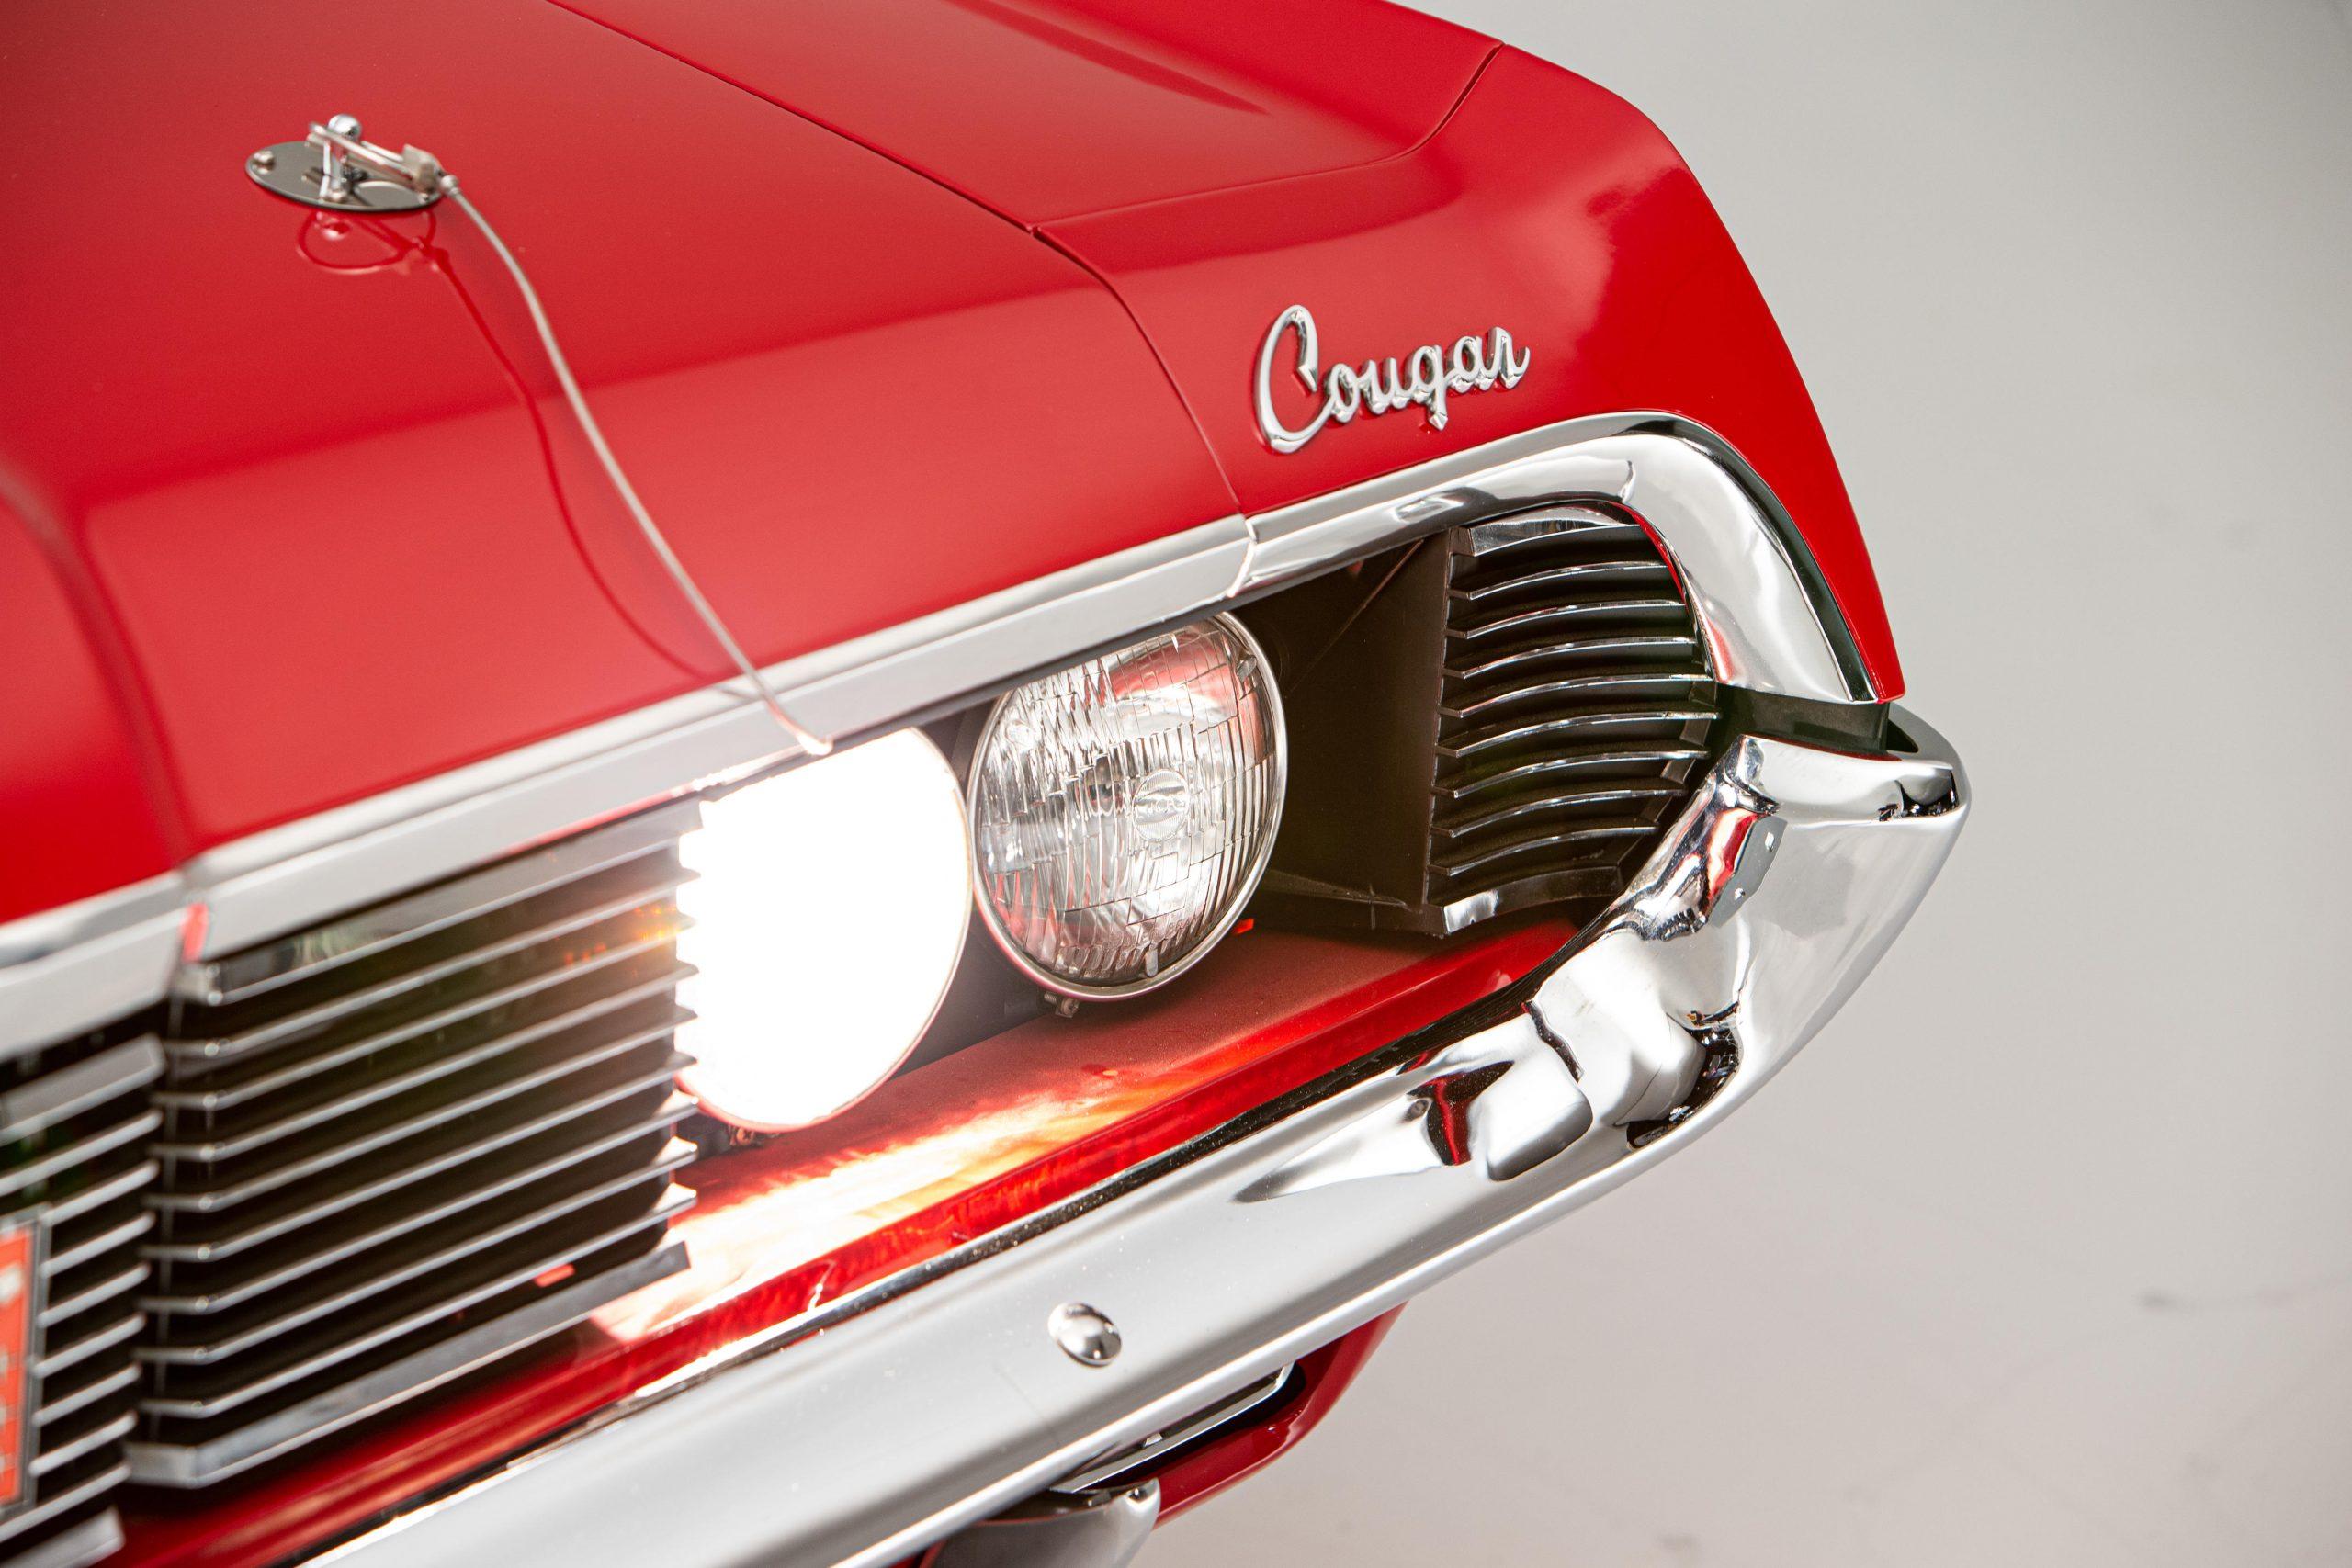 Mercury Cougar Convertible headlight lettering detail